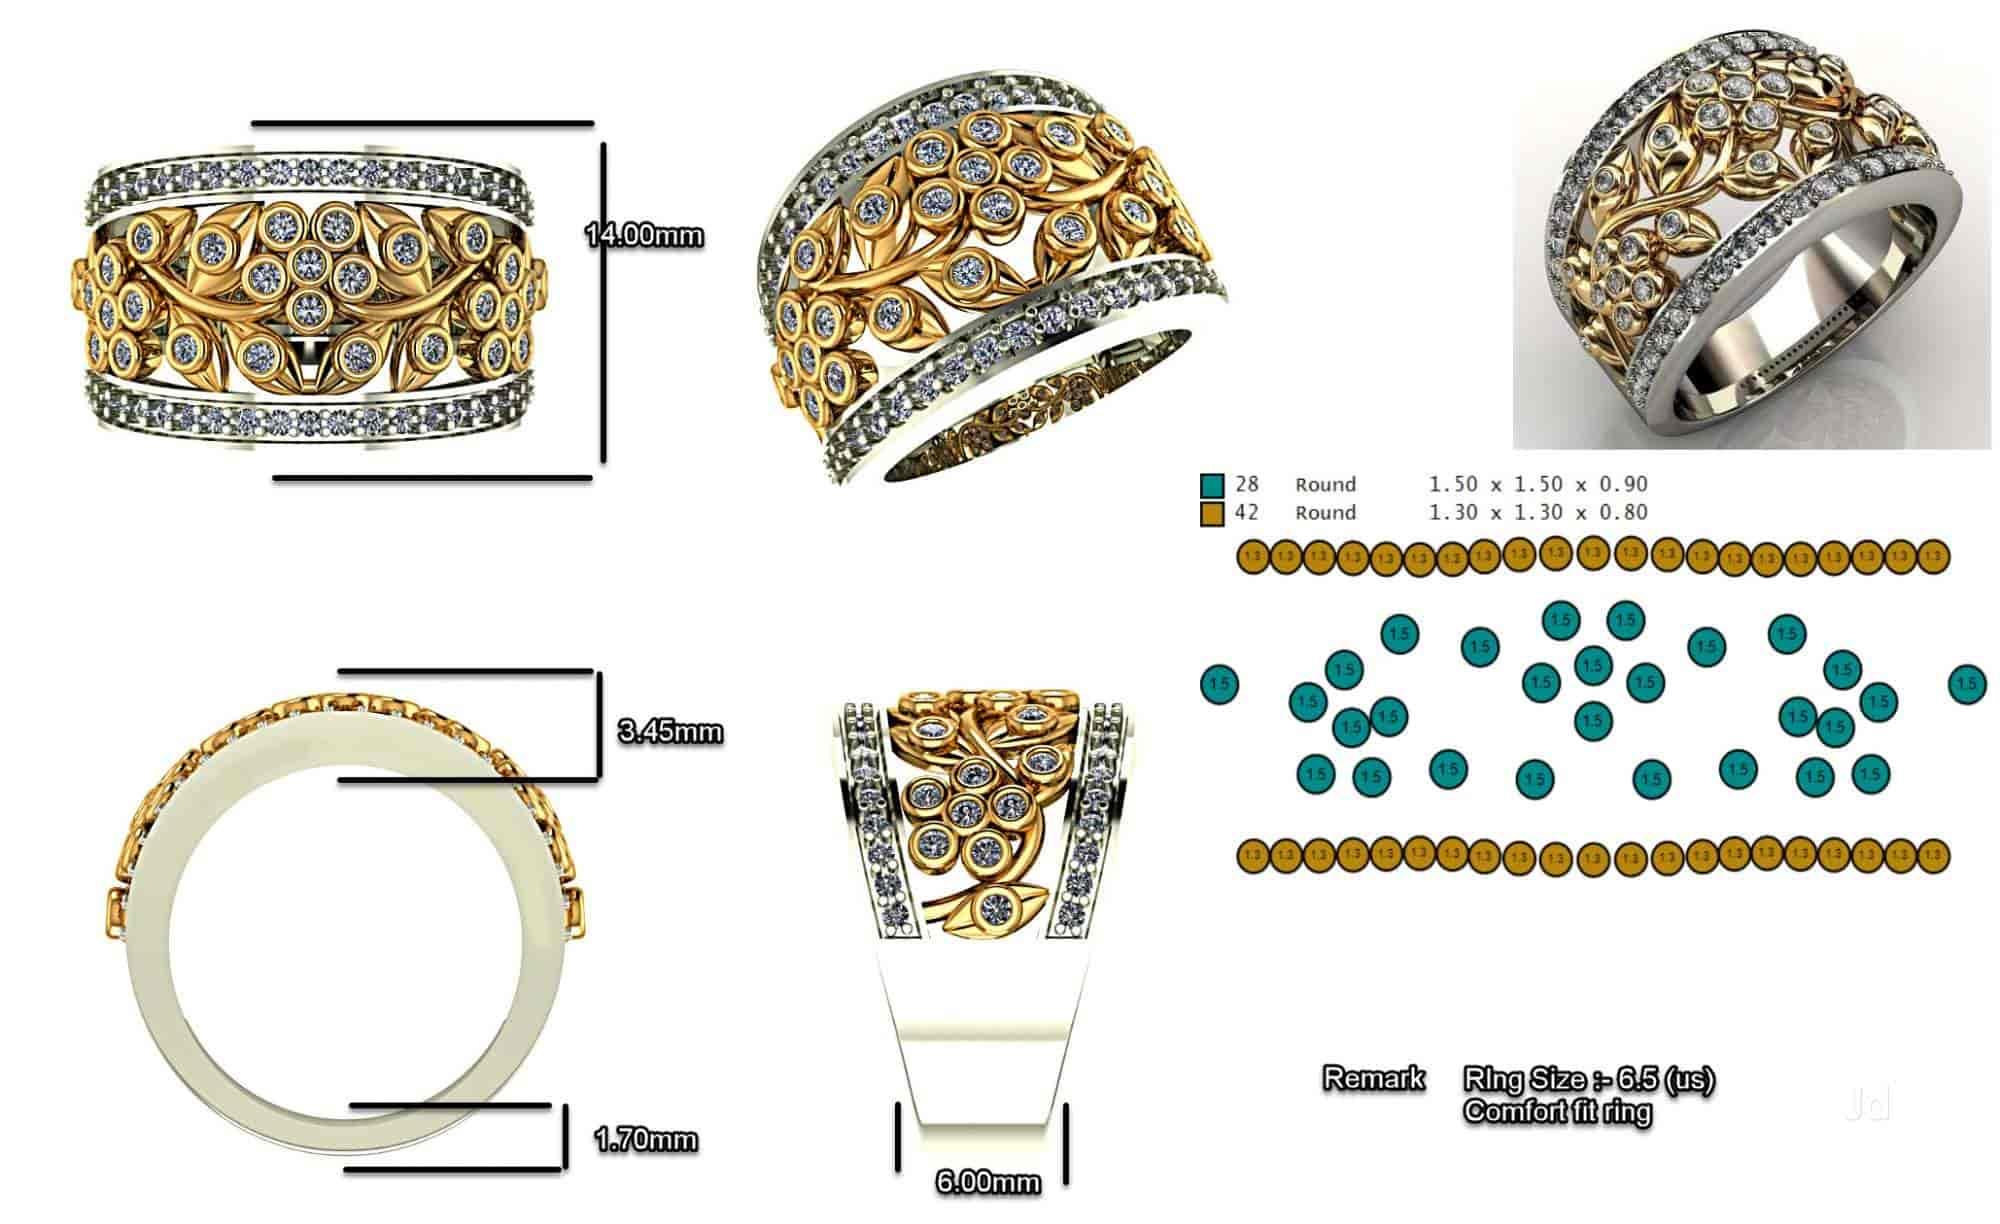 ... Jewellery Design - Diamond 3d Cad Studio Photos, Mira Road, Mumbai - Computer Training ...